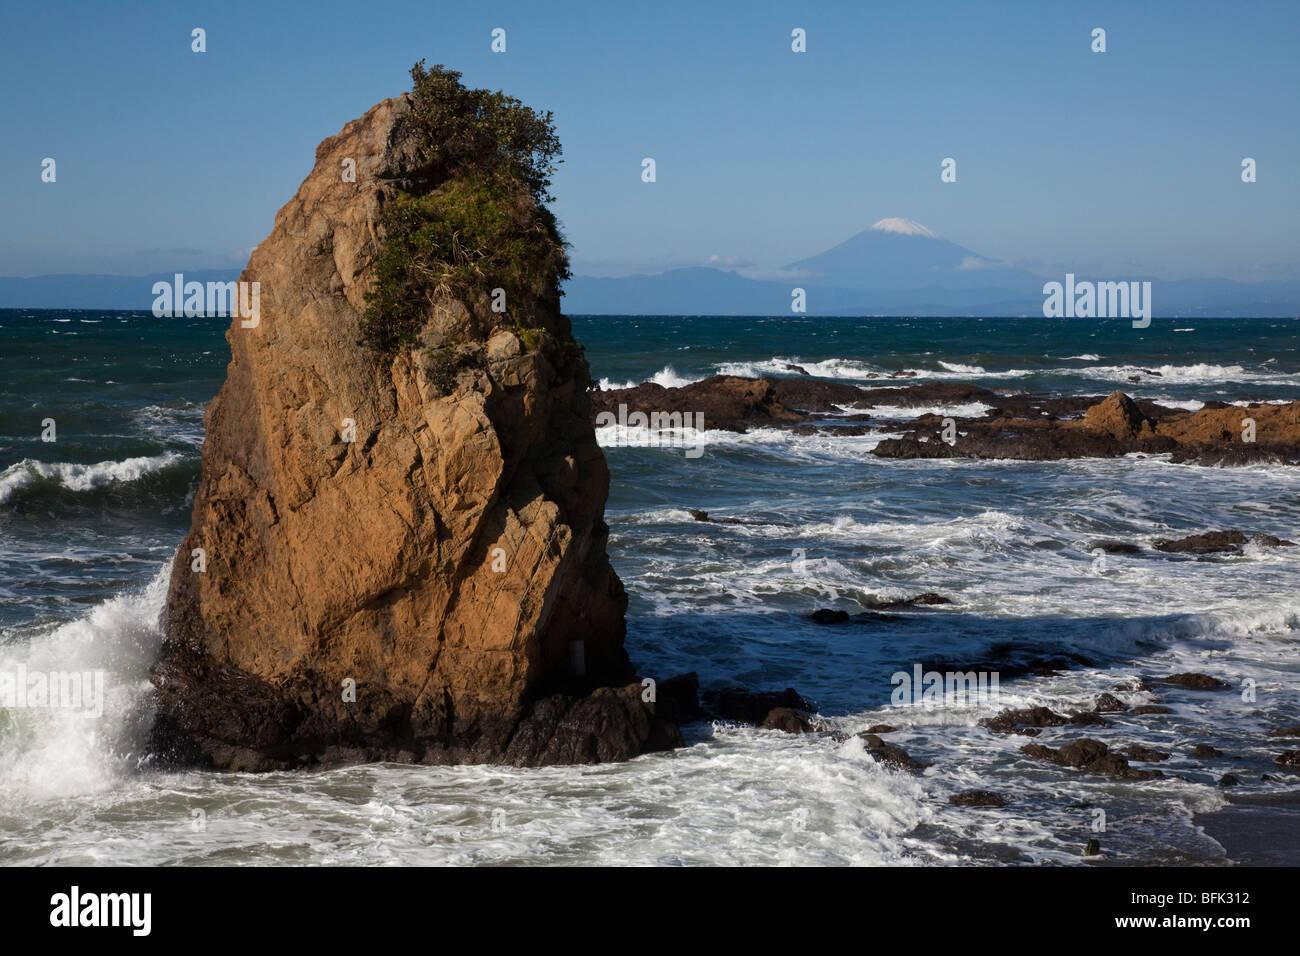 Japan Coast Rocks at Shonan Coast - Stock Image